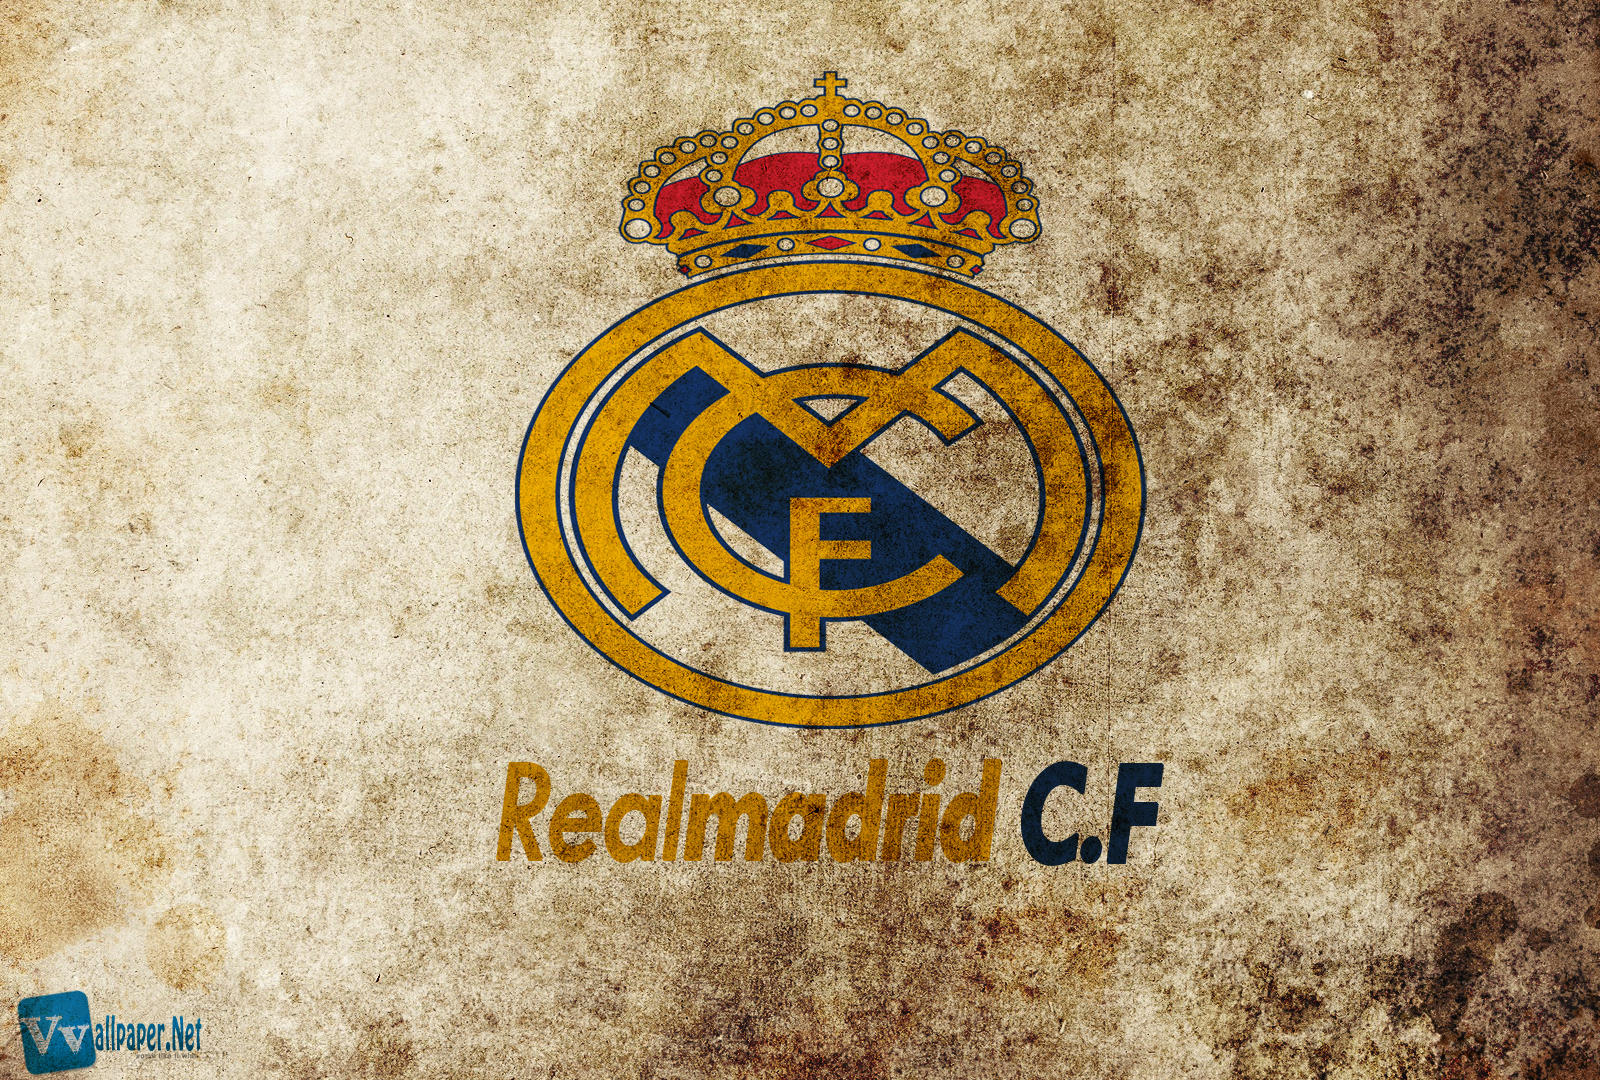 Real Madrid CF Logo HD Desktop Wallpapers Download Wallpapers in 1600x1080